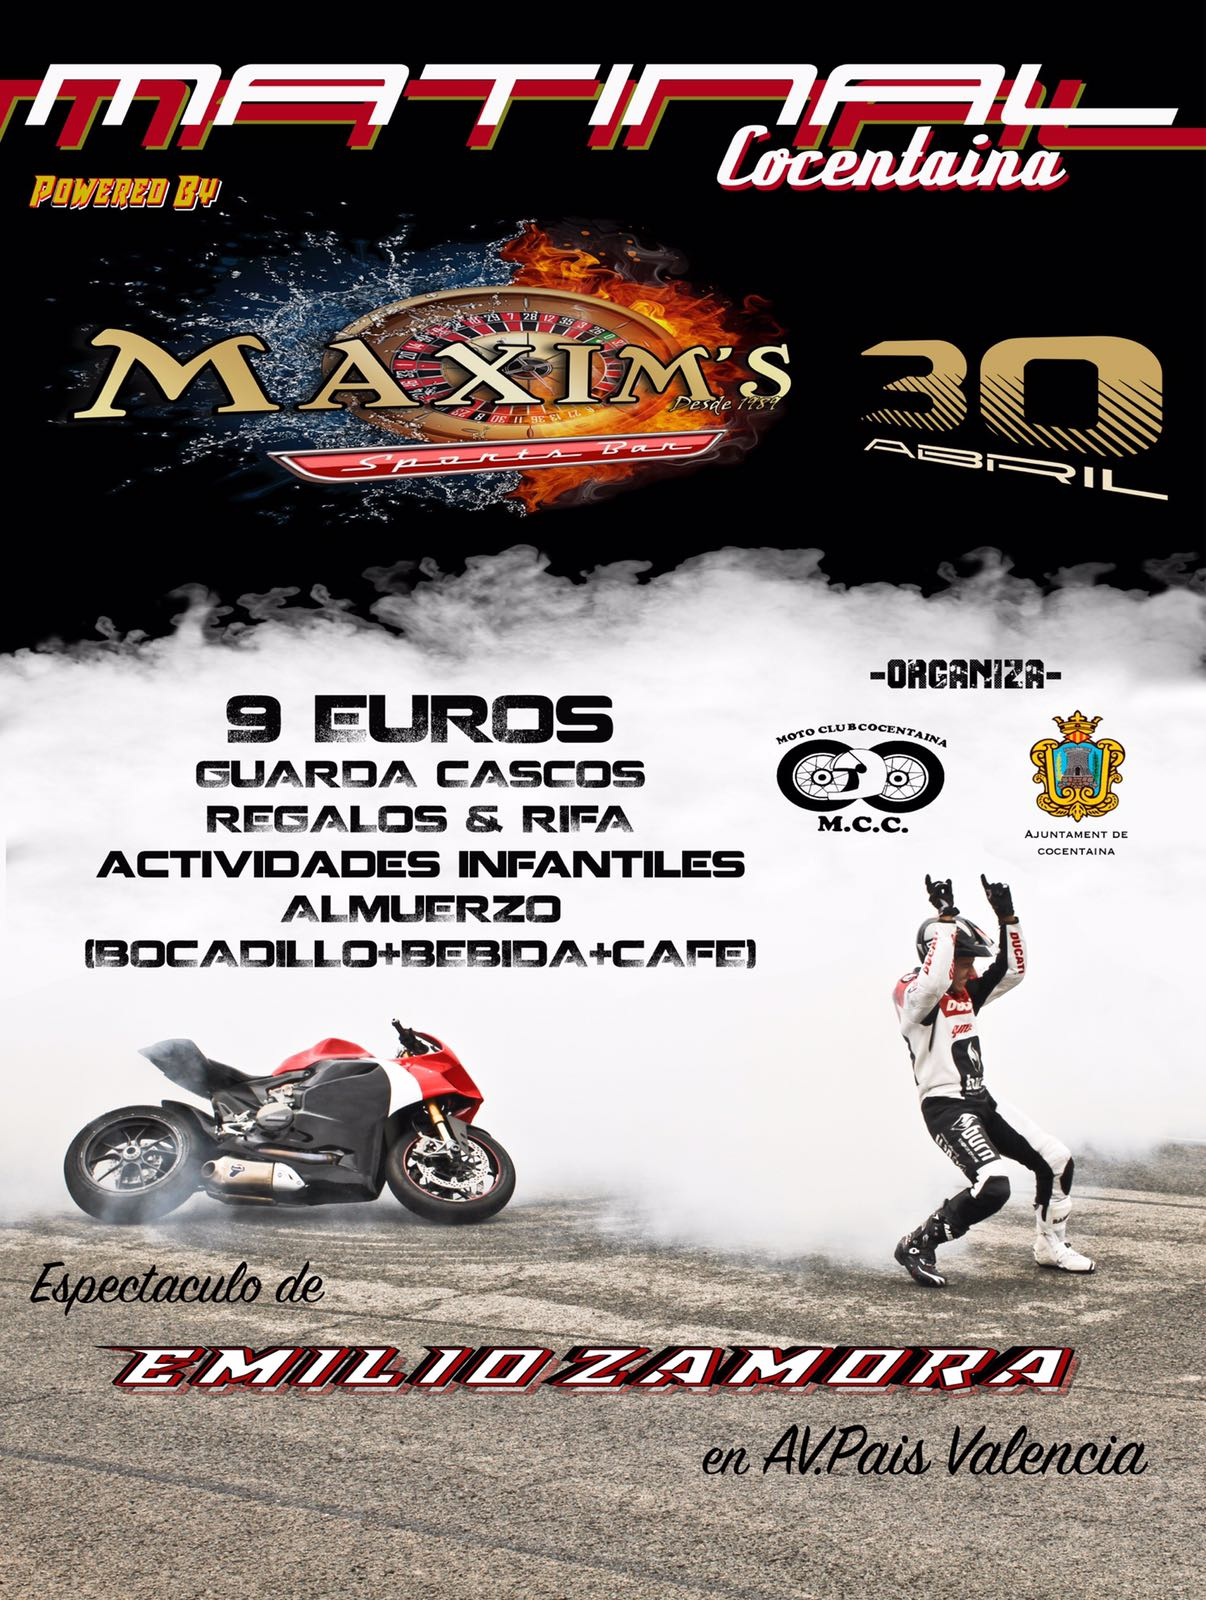 COCENTAINA_MATINAL_MOTERA_MOTOCLUB_EMILIO_ZAMORA_ESPECTACULO_MOTO_MOTOR_SHOW_DUCATI_STUNT_TEAM_2017